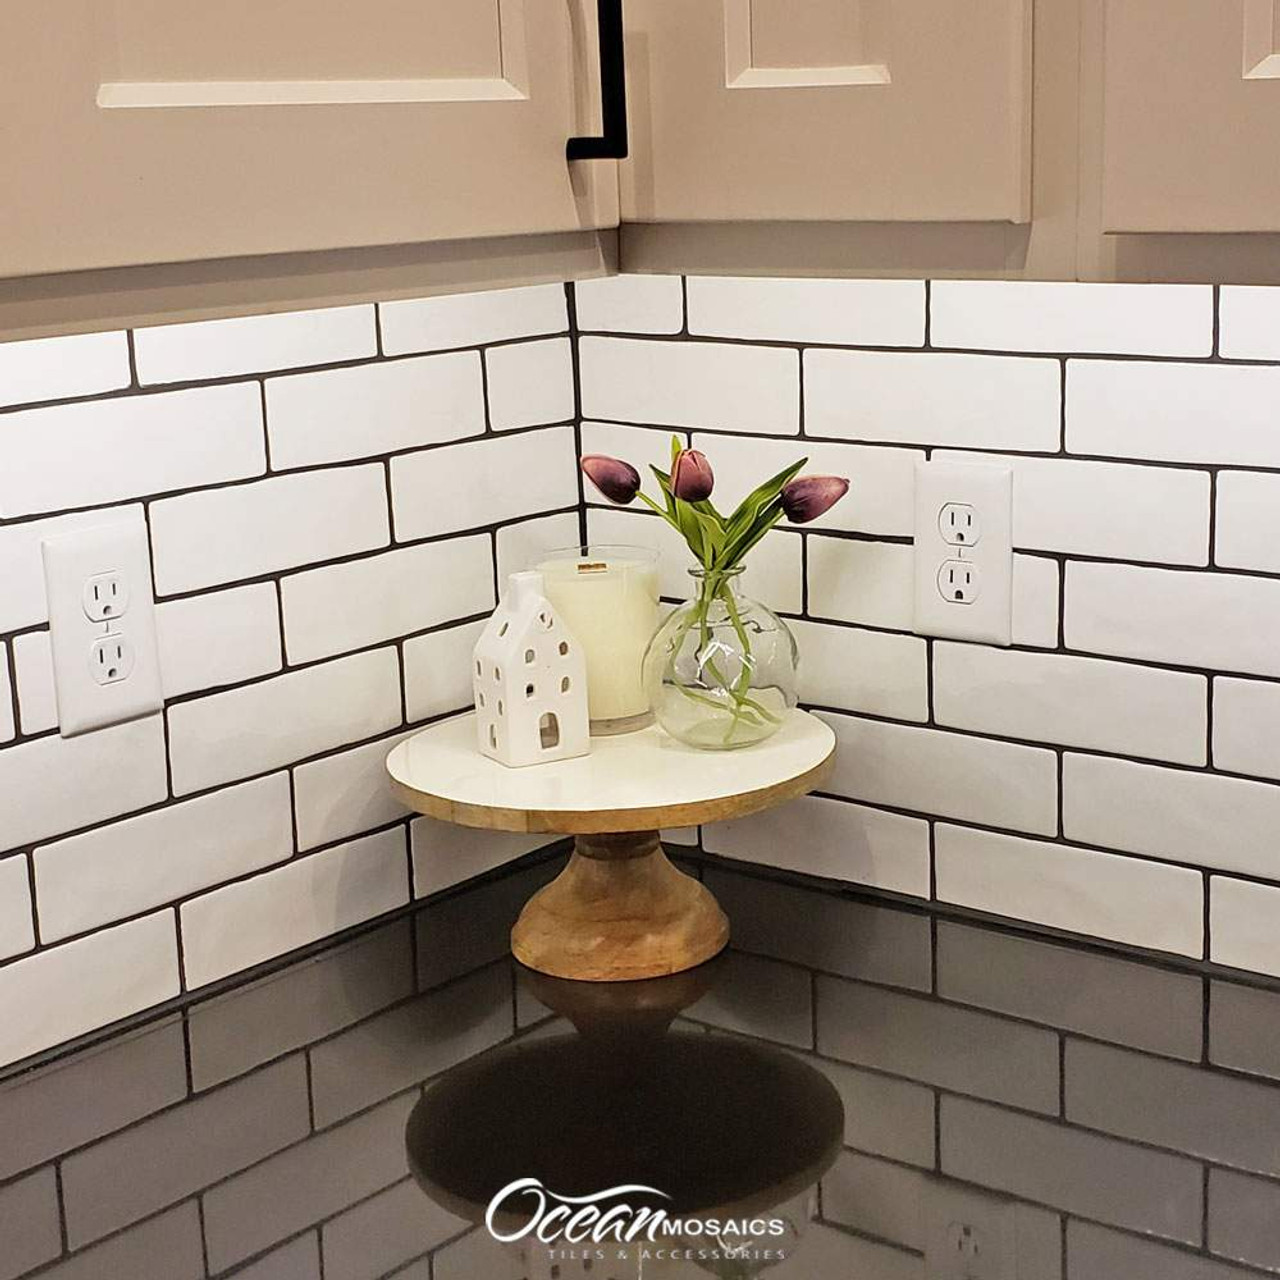 Pastel Buff Beige Glossy 2x8 Porcelain Subway Tile Sample Approximately 3 x 6